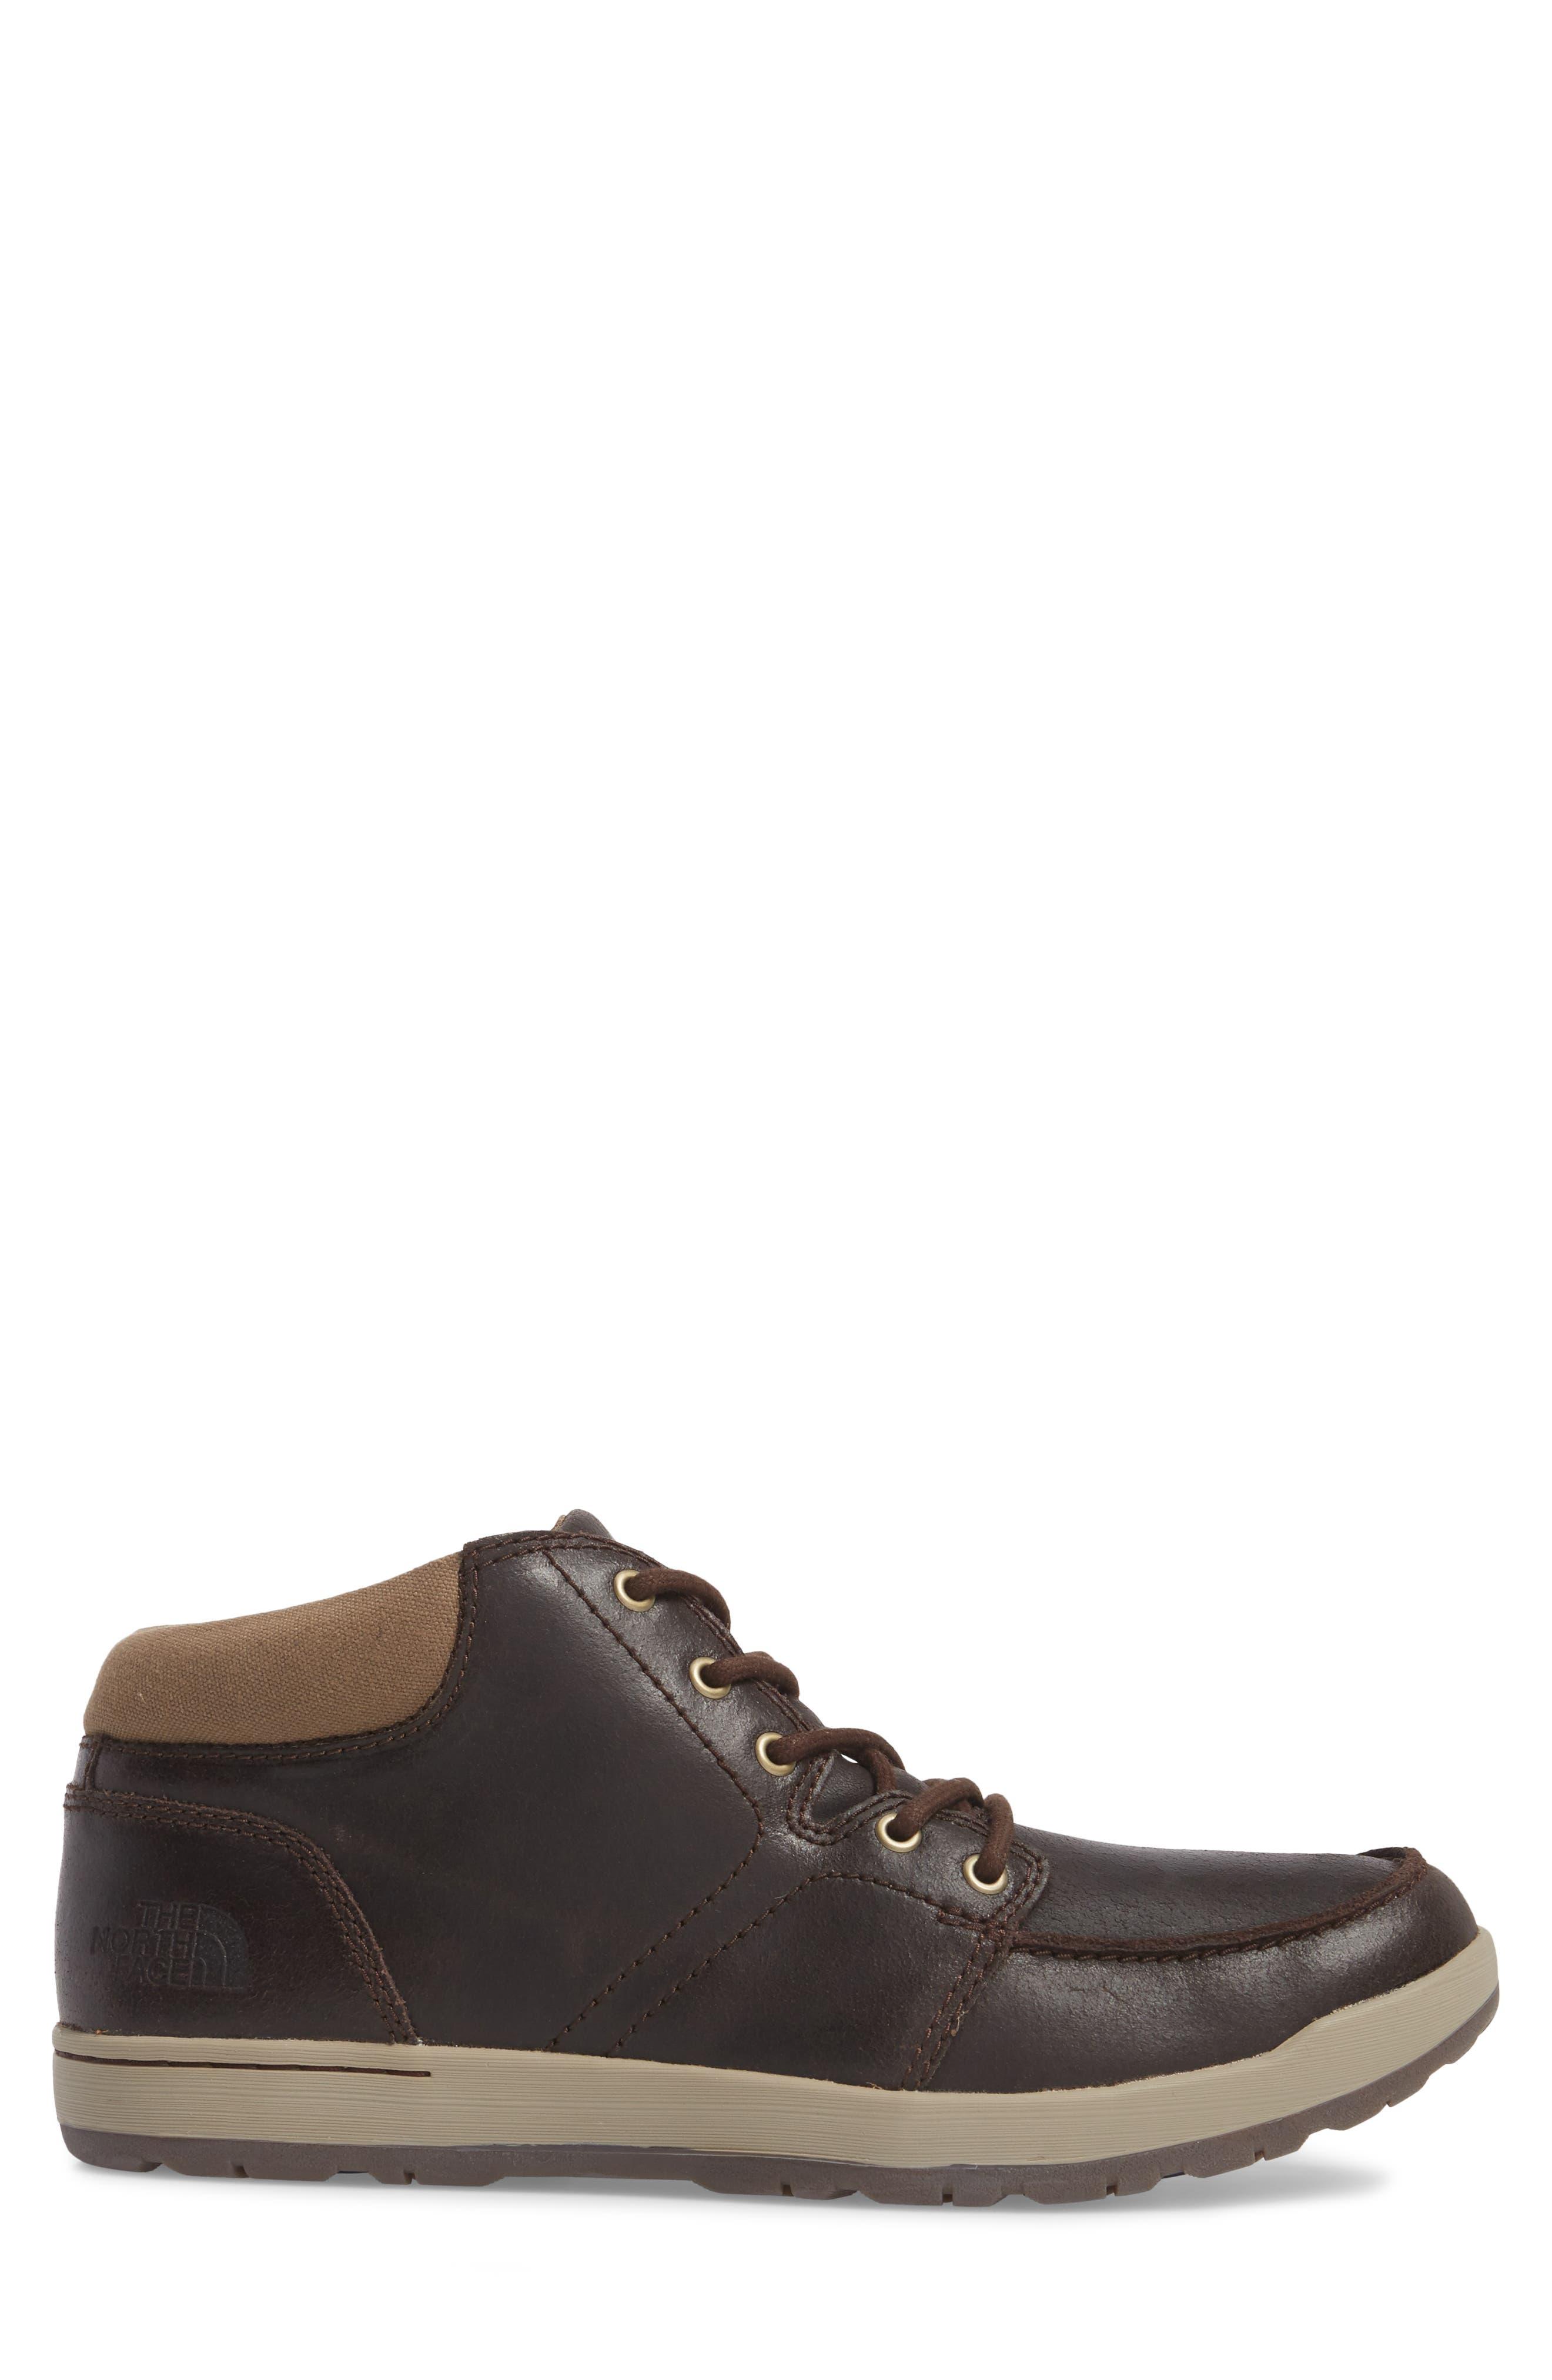 Ballard Evo Moc Toe Boot,                             Alternate thumbnail 3, color,                             Demitasse Brown